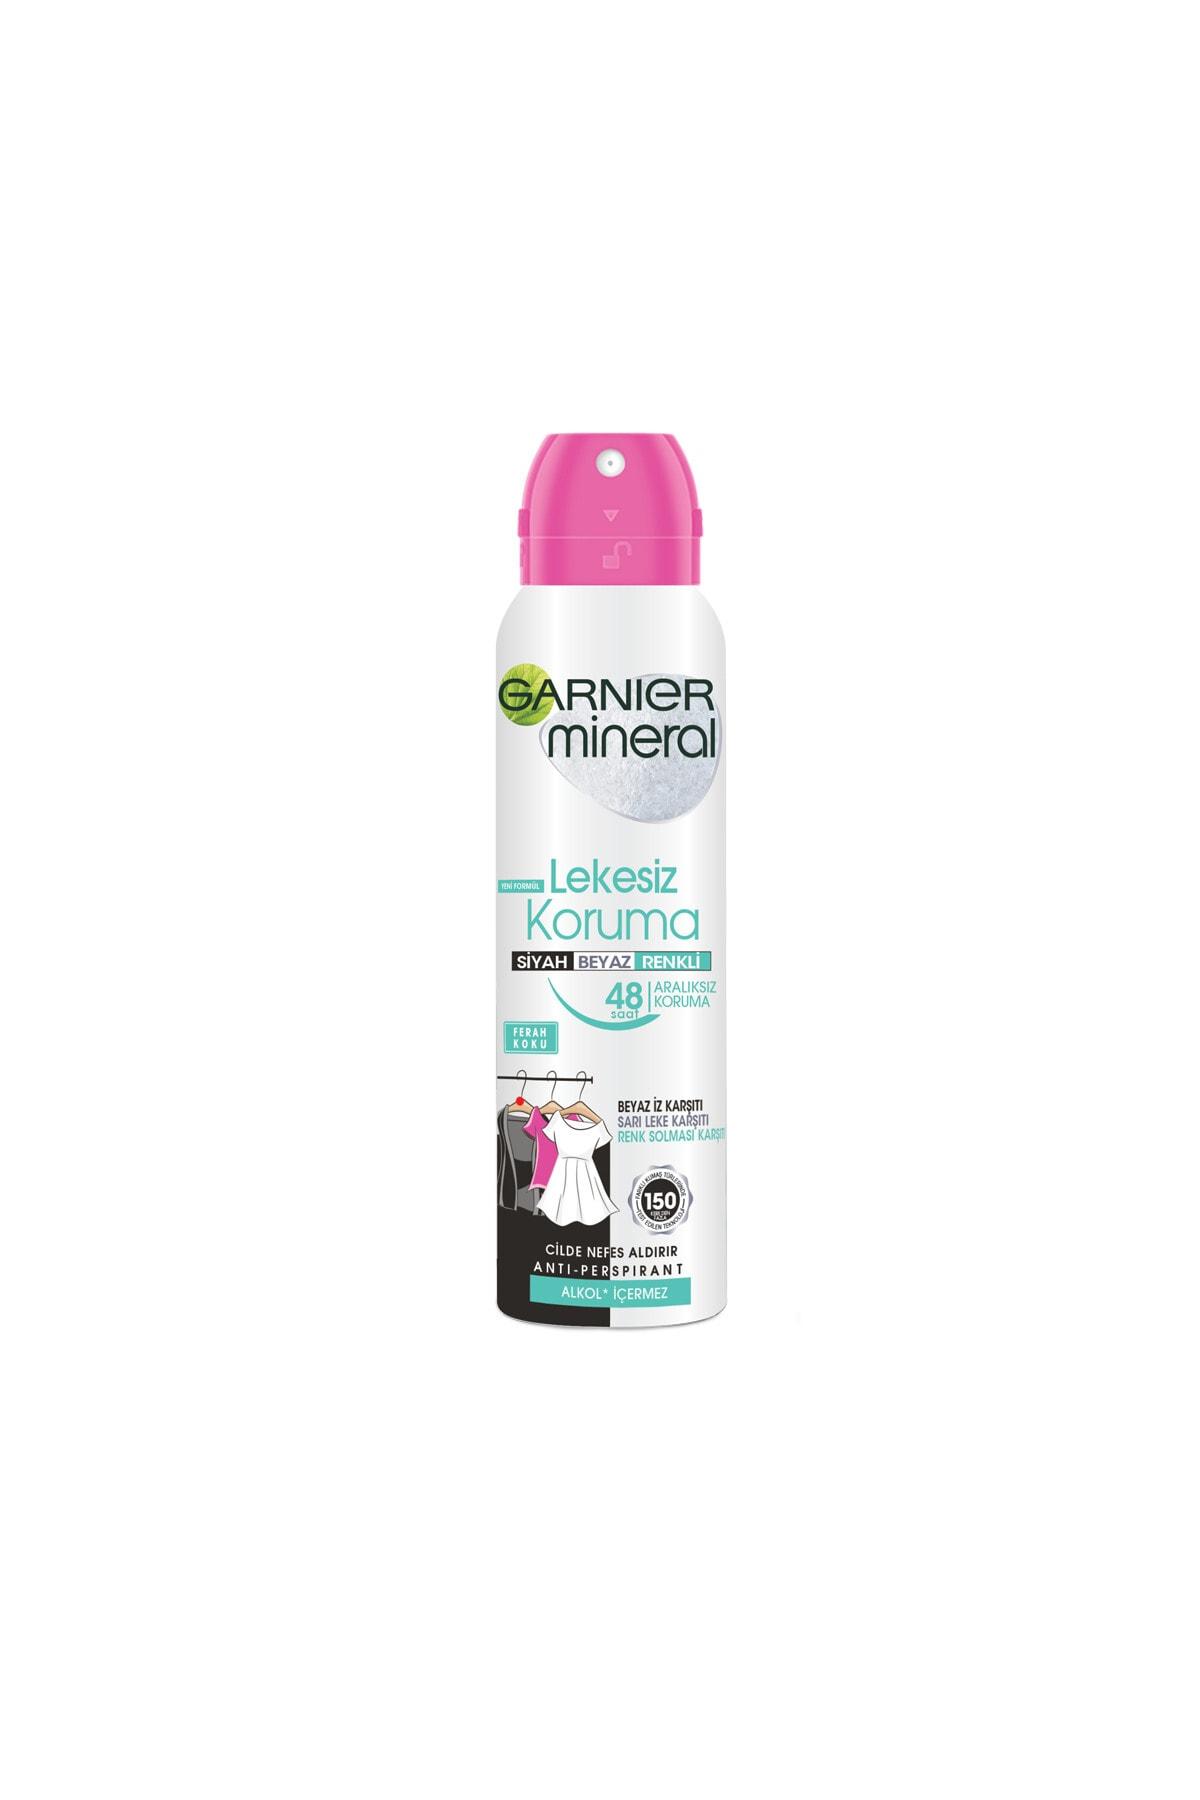 Garnier Mineral Lekesiz Koruma Sprey Deodorant 150 Ml - Alkolsüz 2